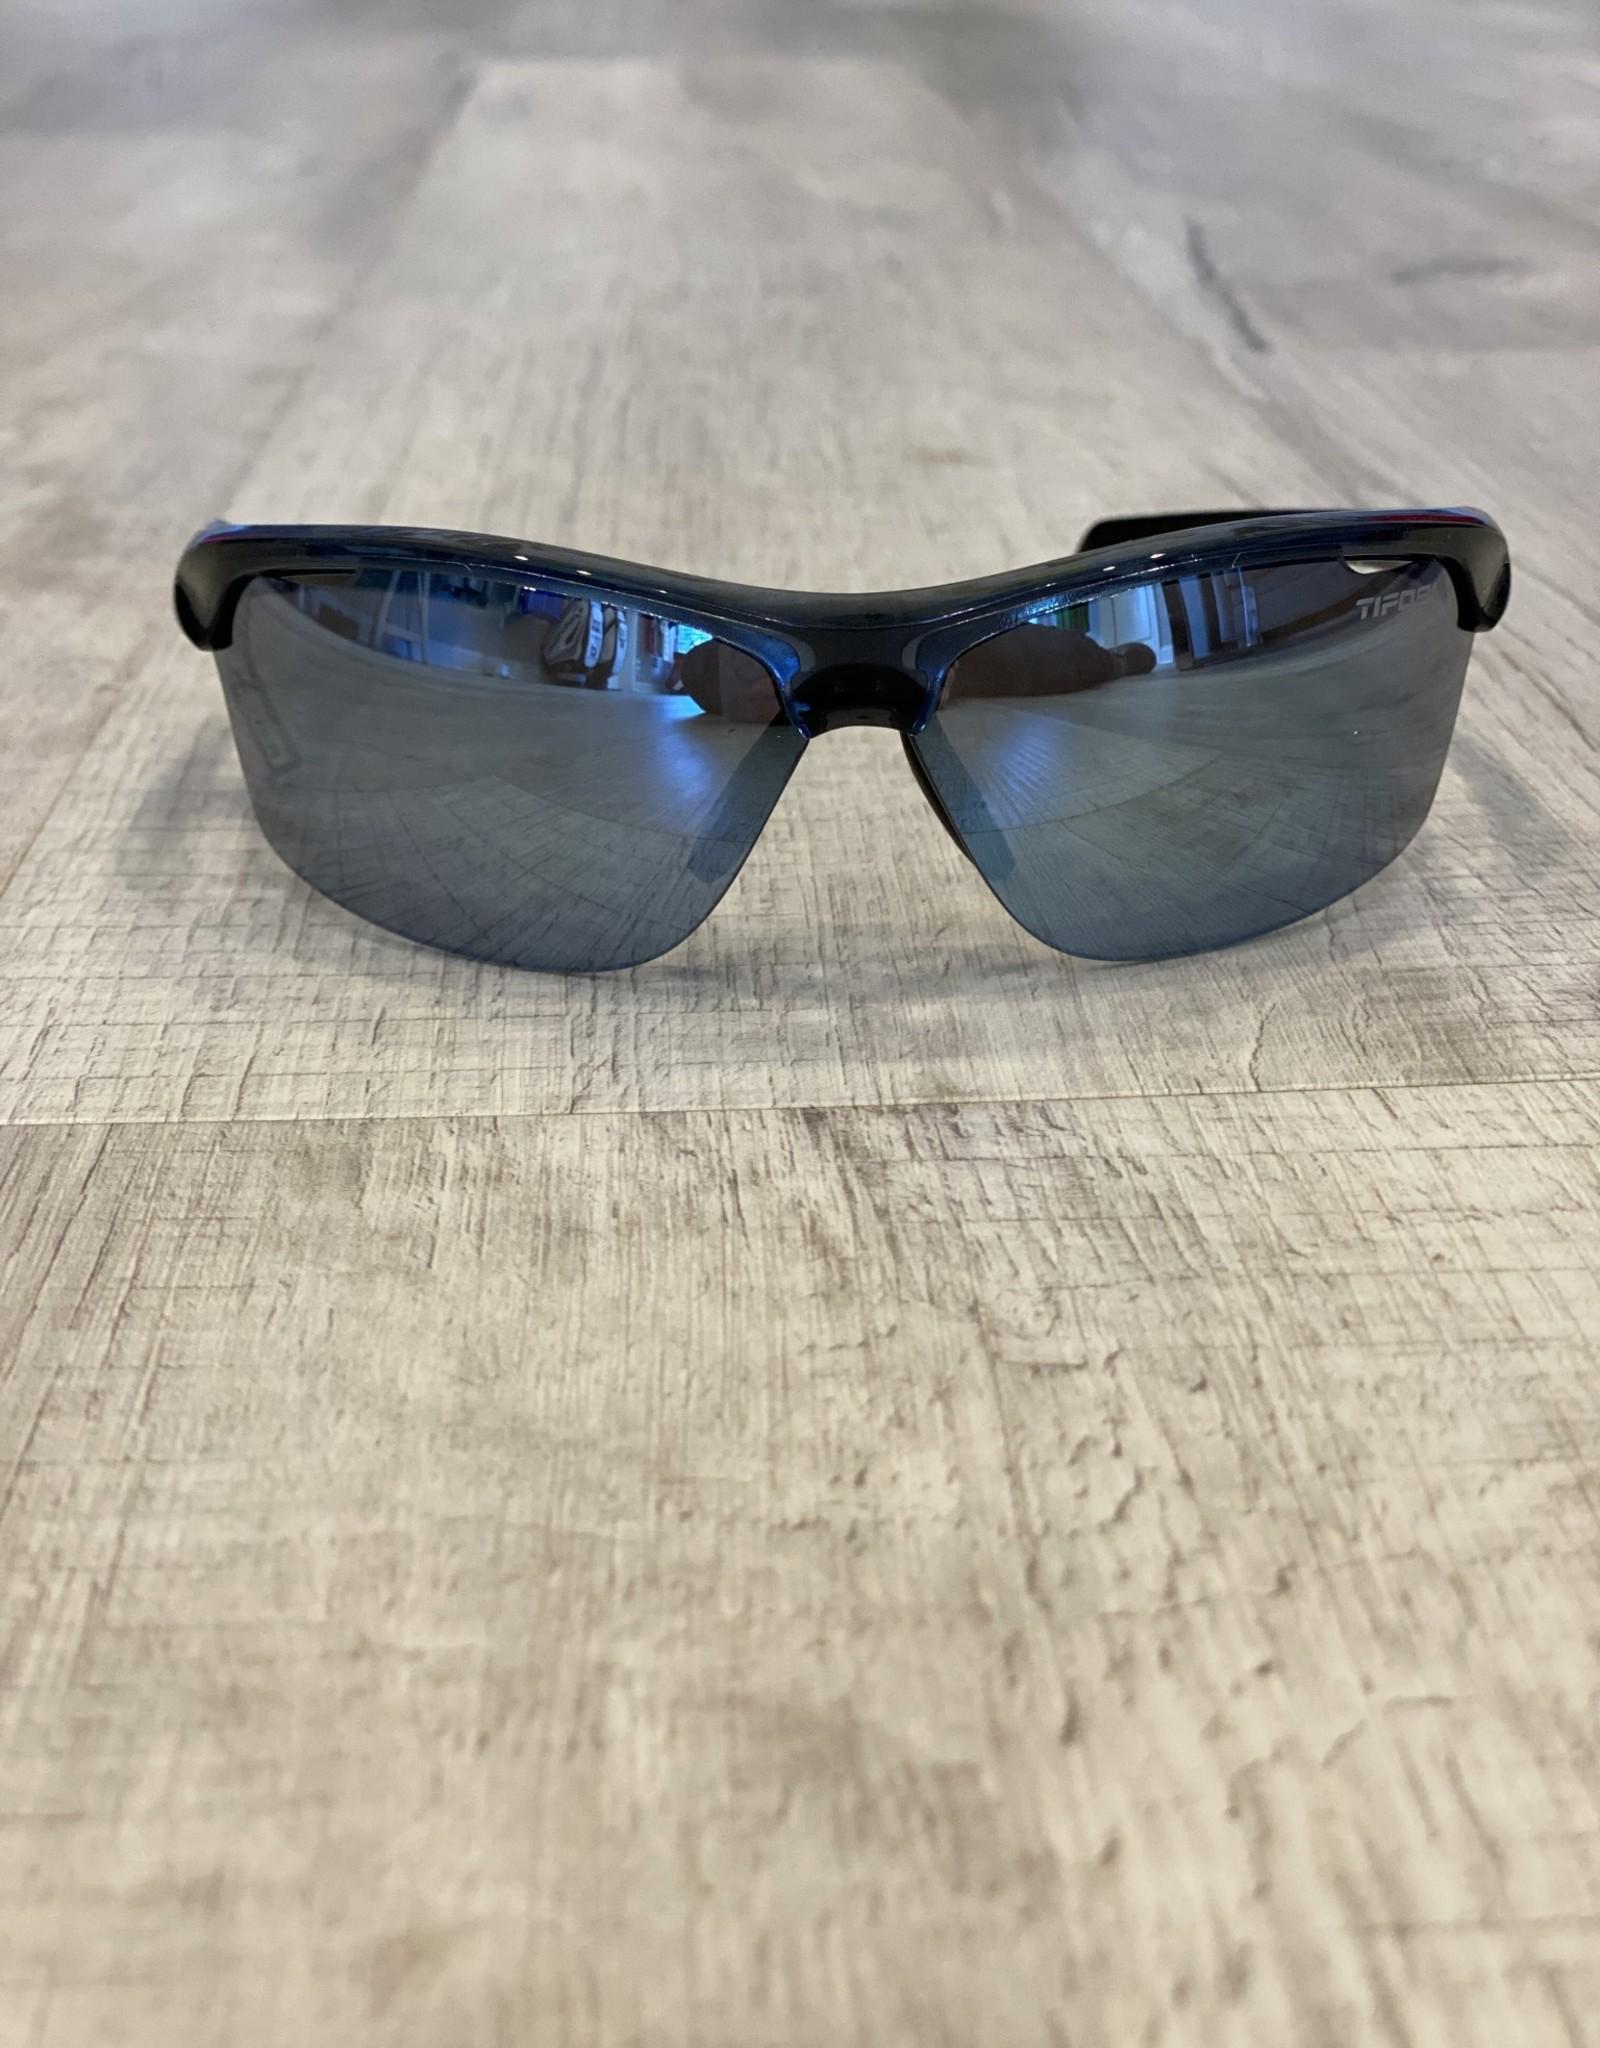 Tifosi Intense Sunglasses